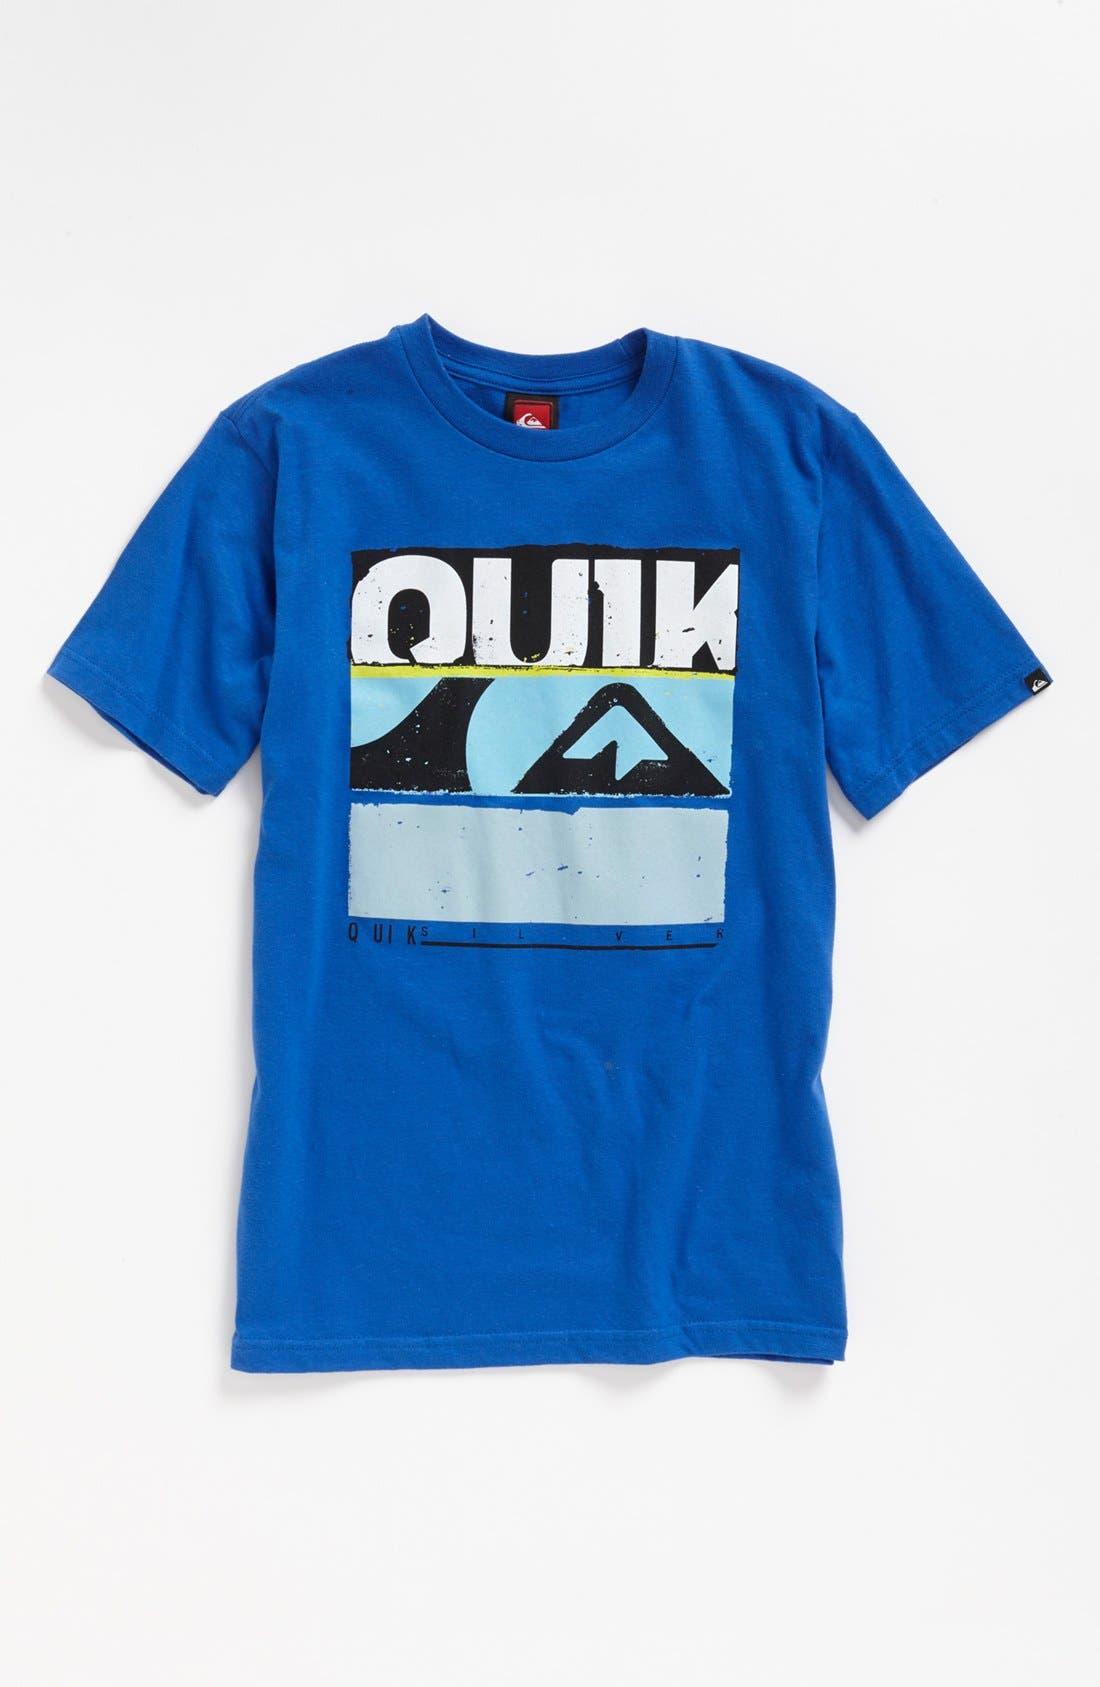 Main Image - Quiksilver 'Unglued' T-Shirt (Little Boys & Big Boys) (Online Only)